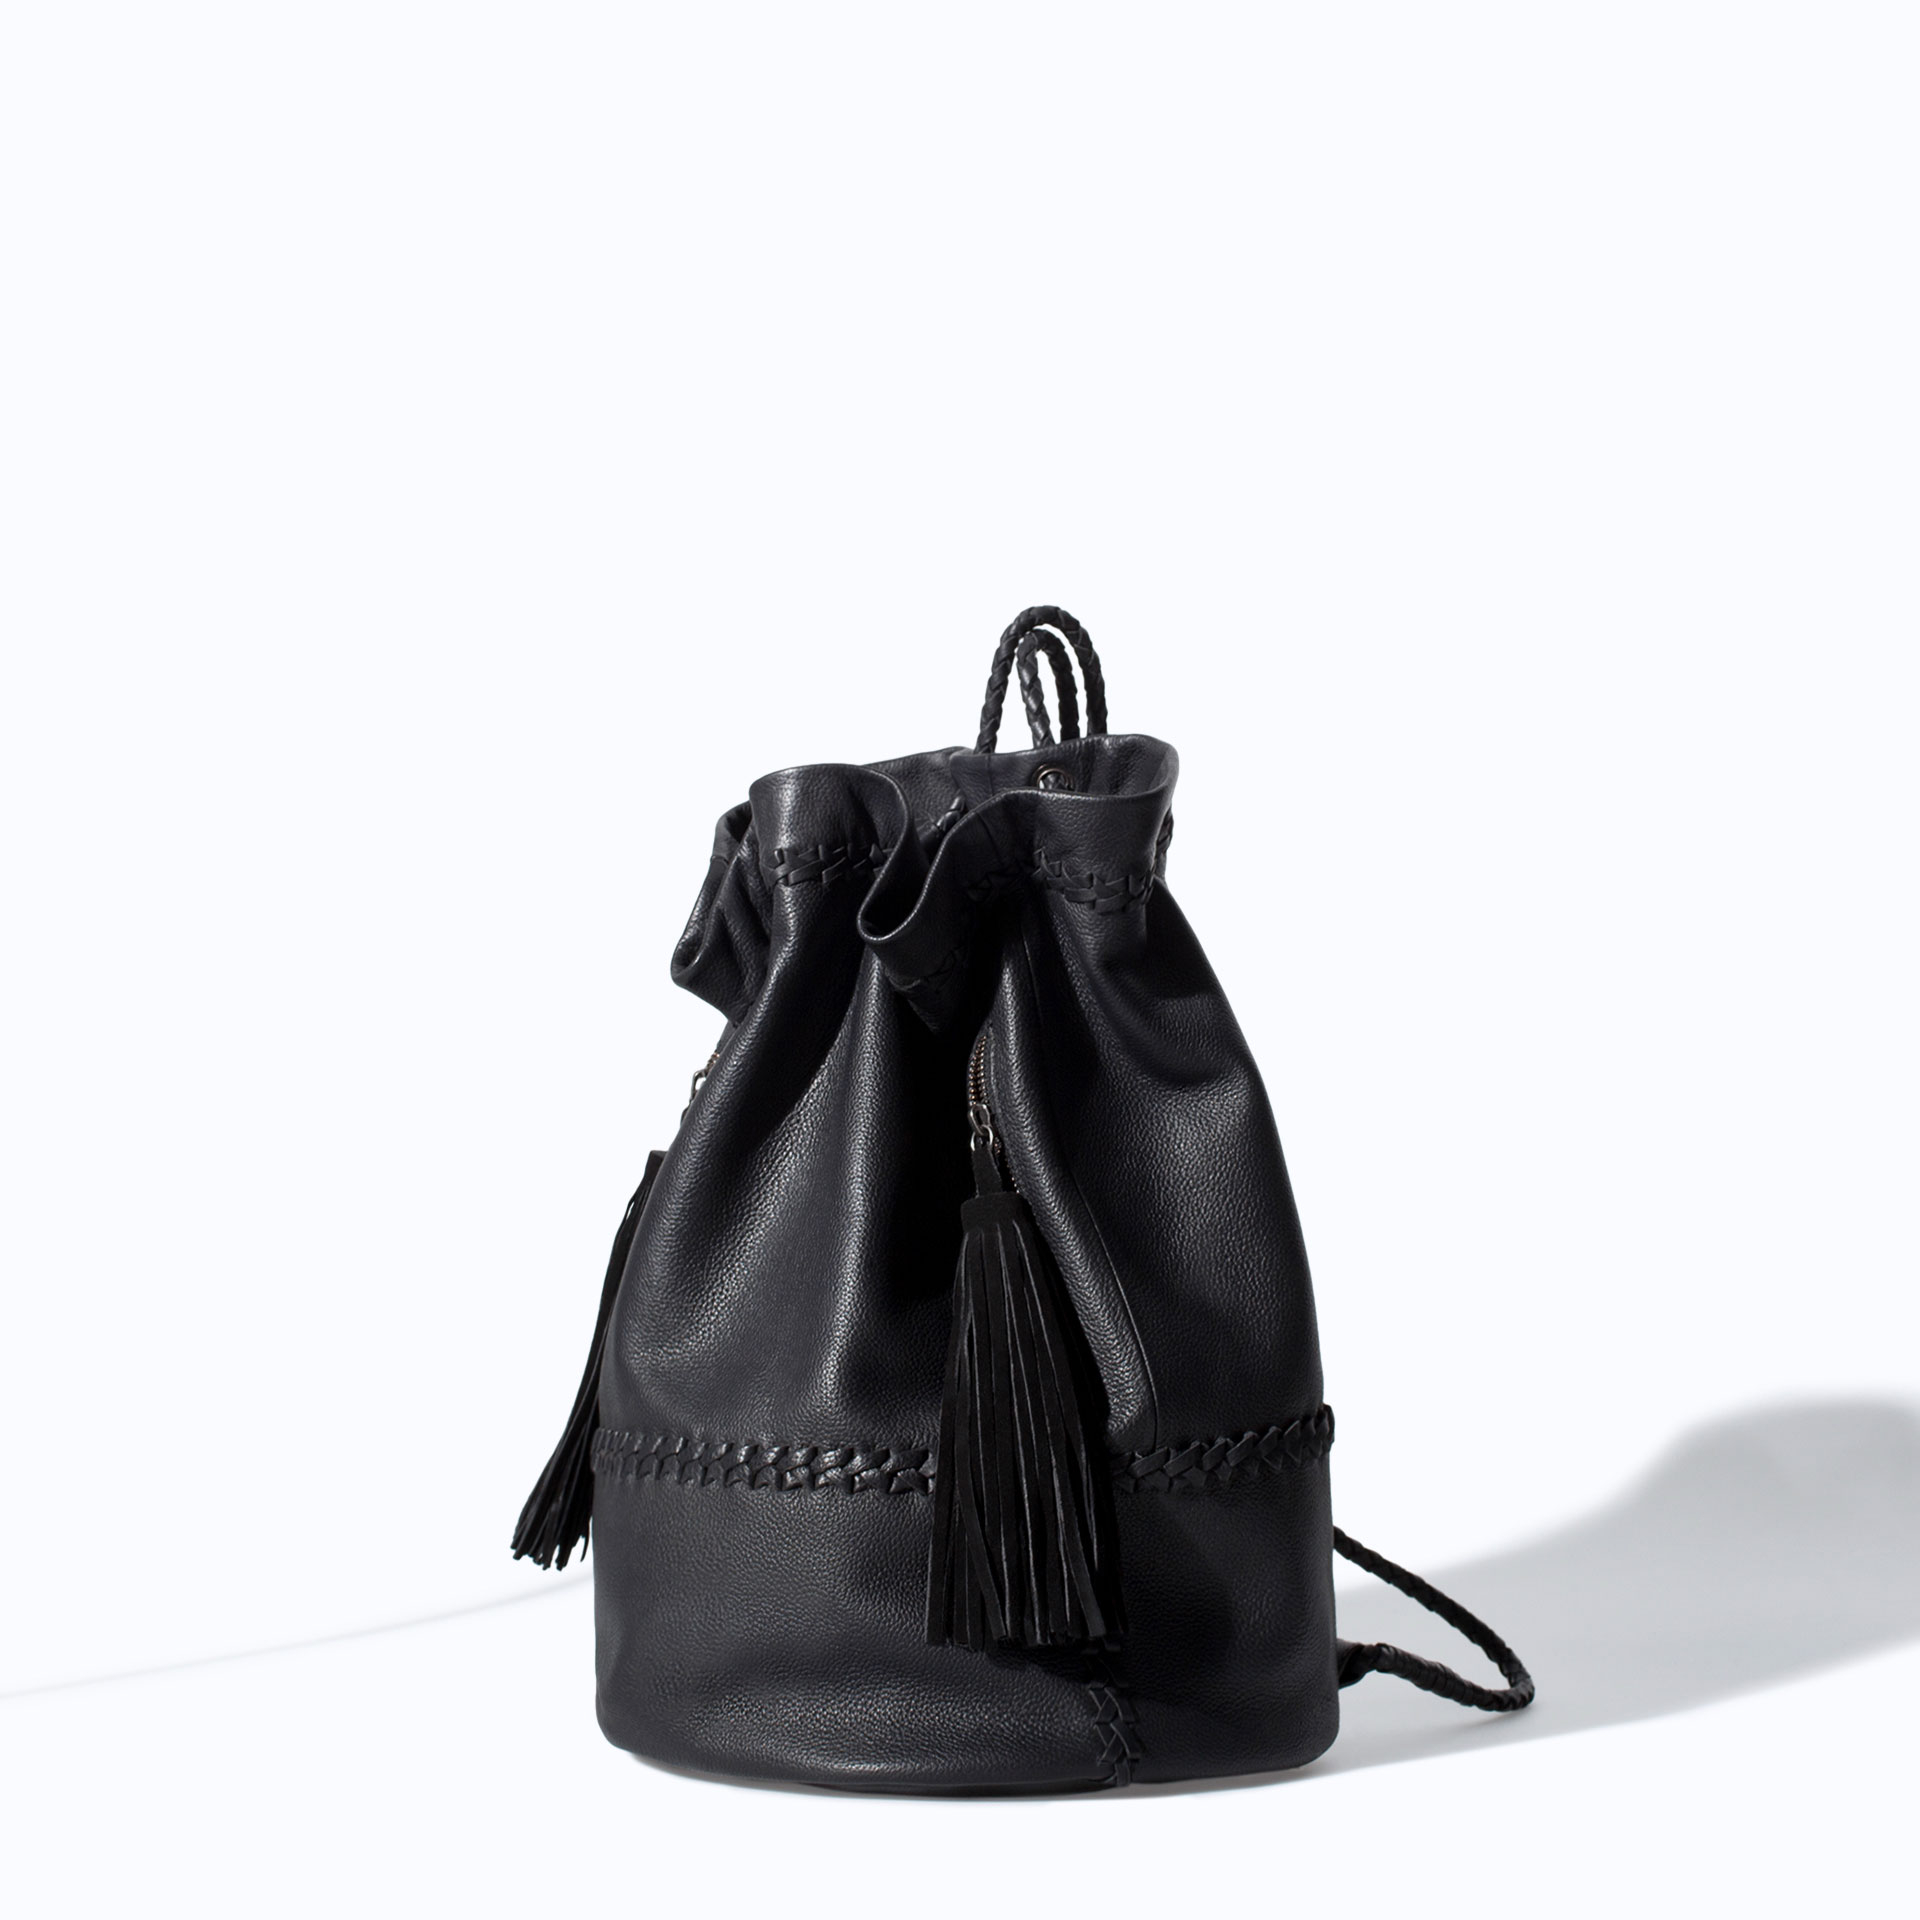 5f529b6c570 Zara Leather Bucket Bag with Tassels in Black